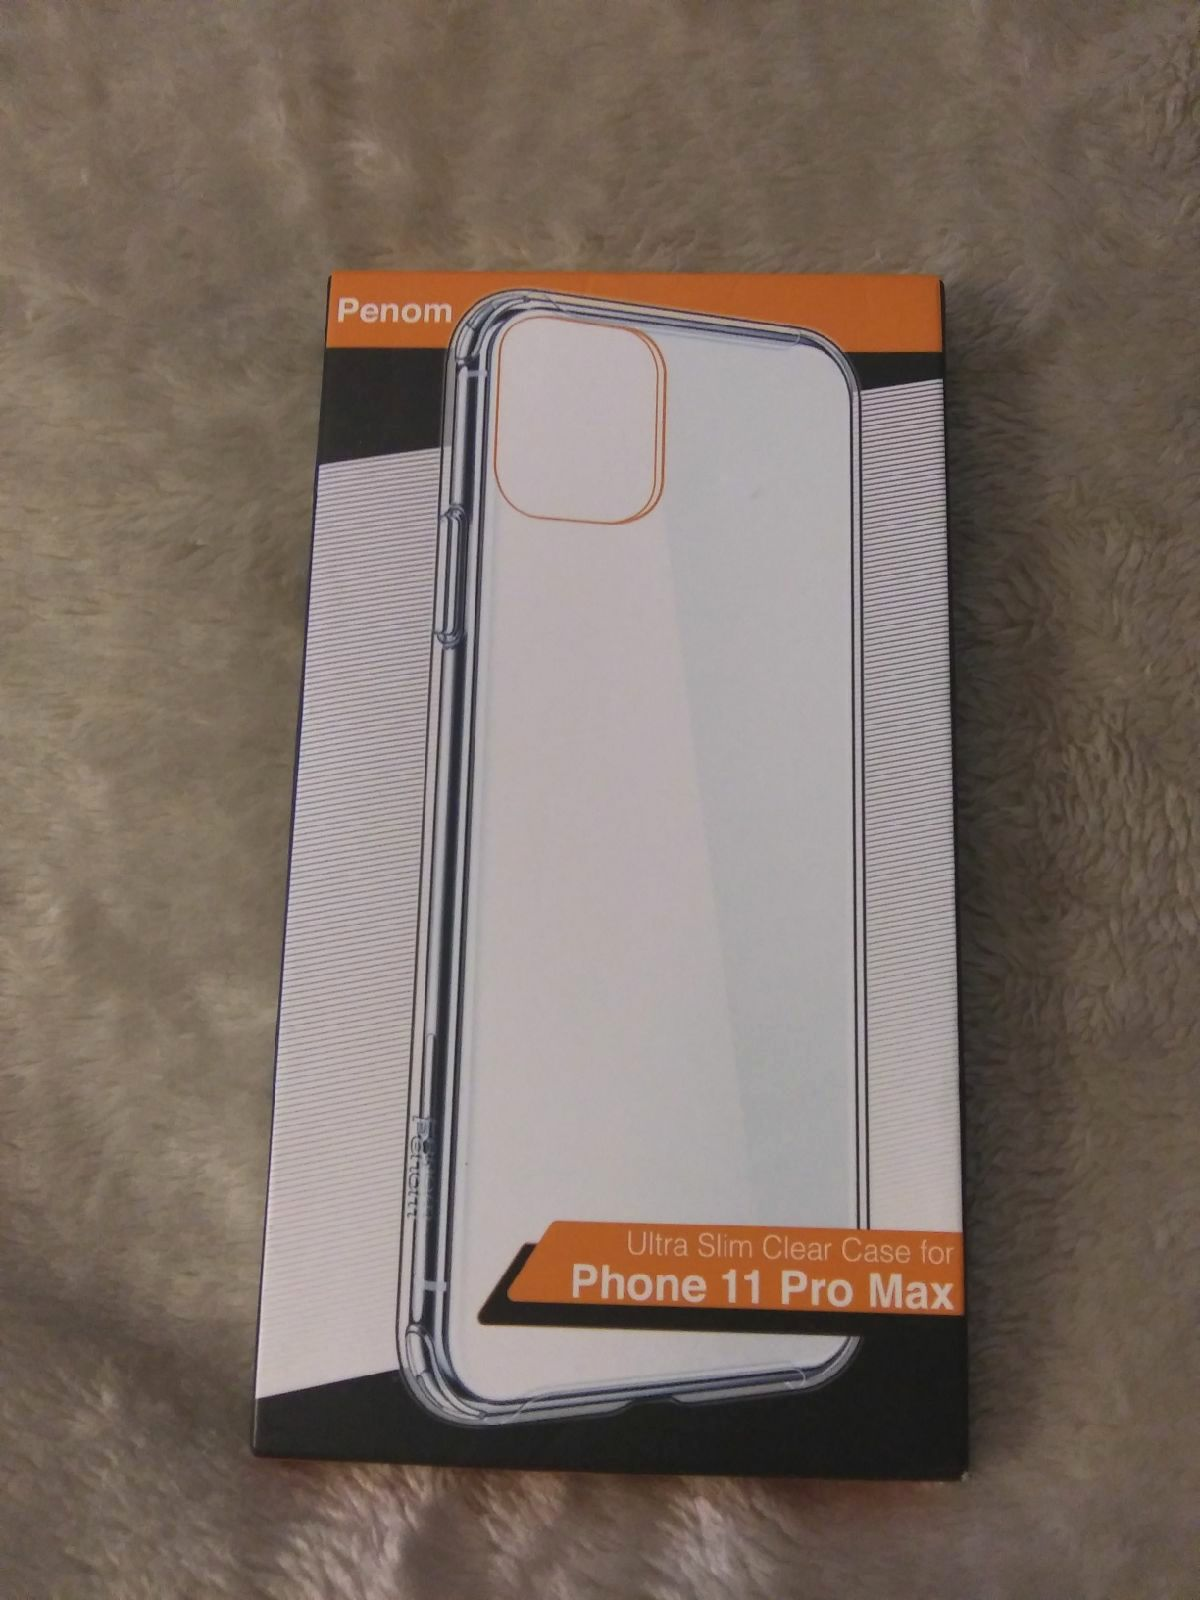 Pemon I Phone 11 Pro Max Phone Case